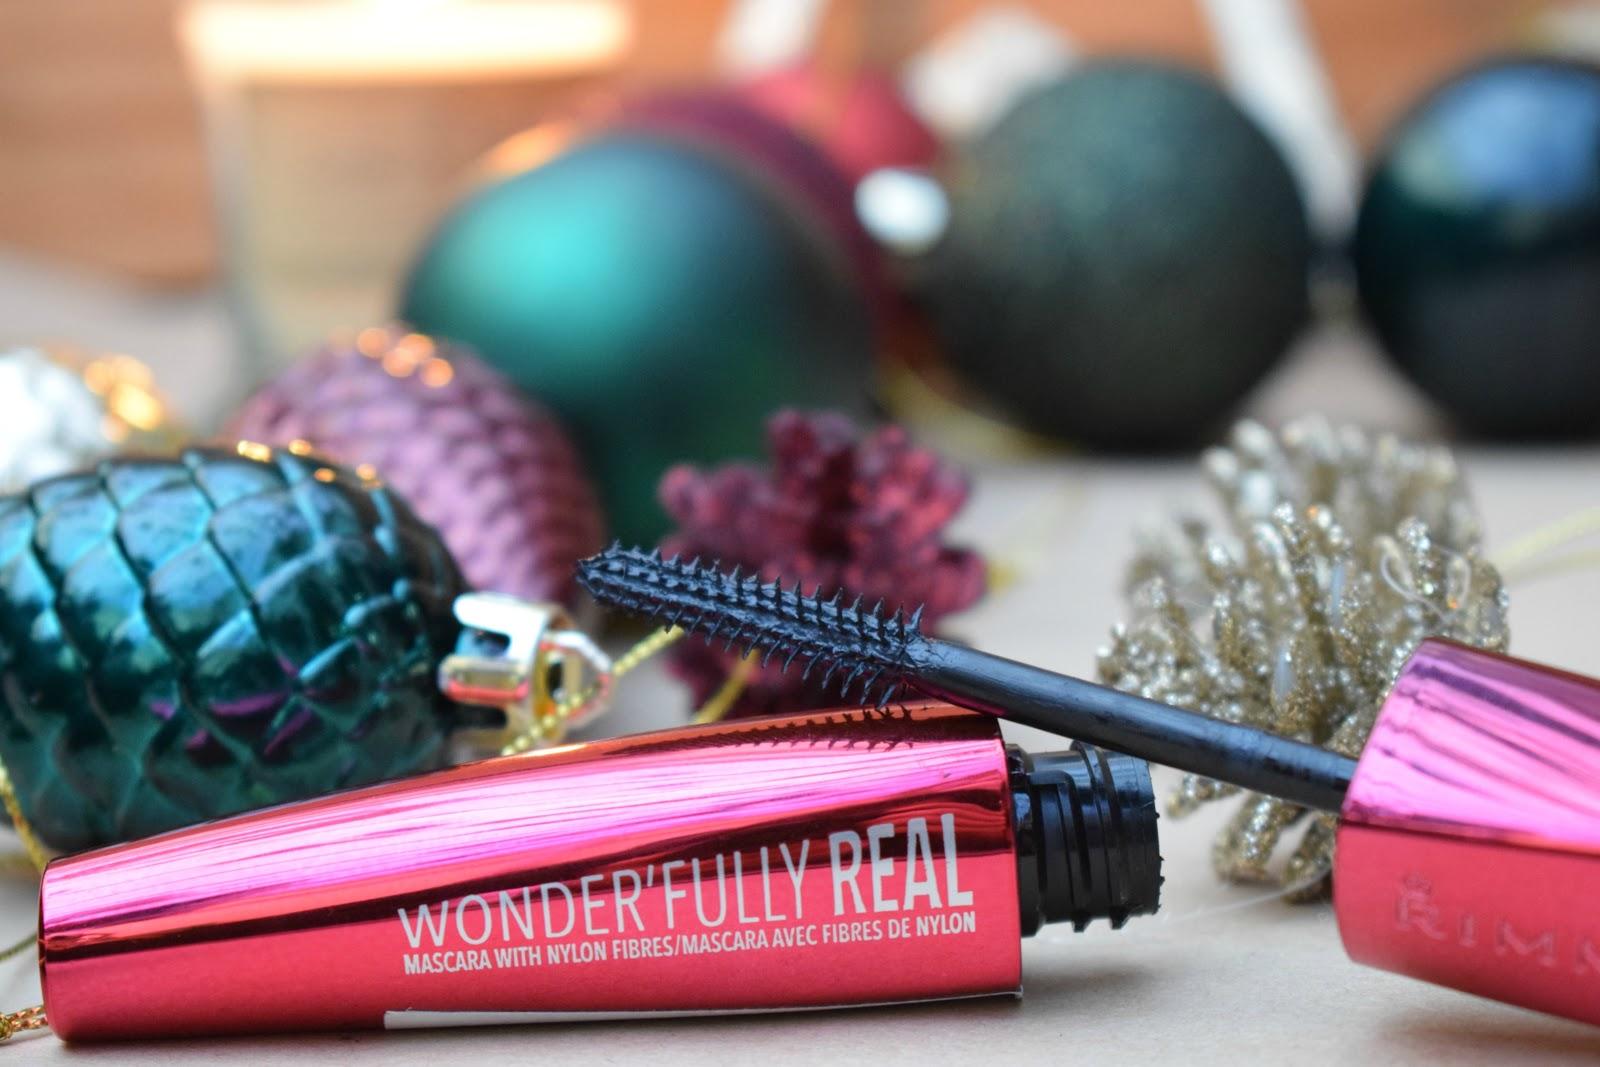 da4ec6cab39 Kate's Closet: Beauty - Rimmel Wonder'fully real Mascara review